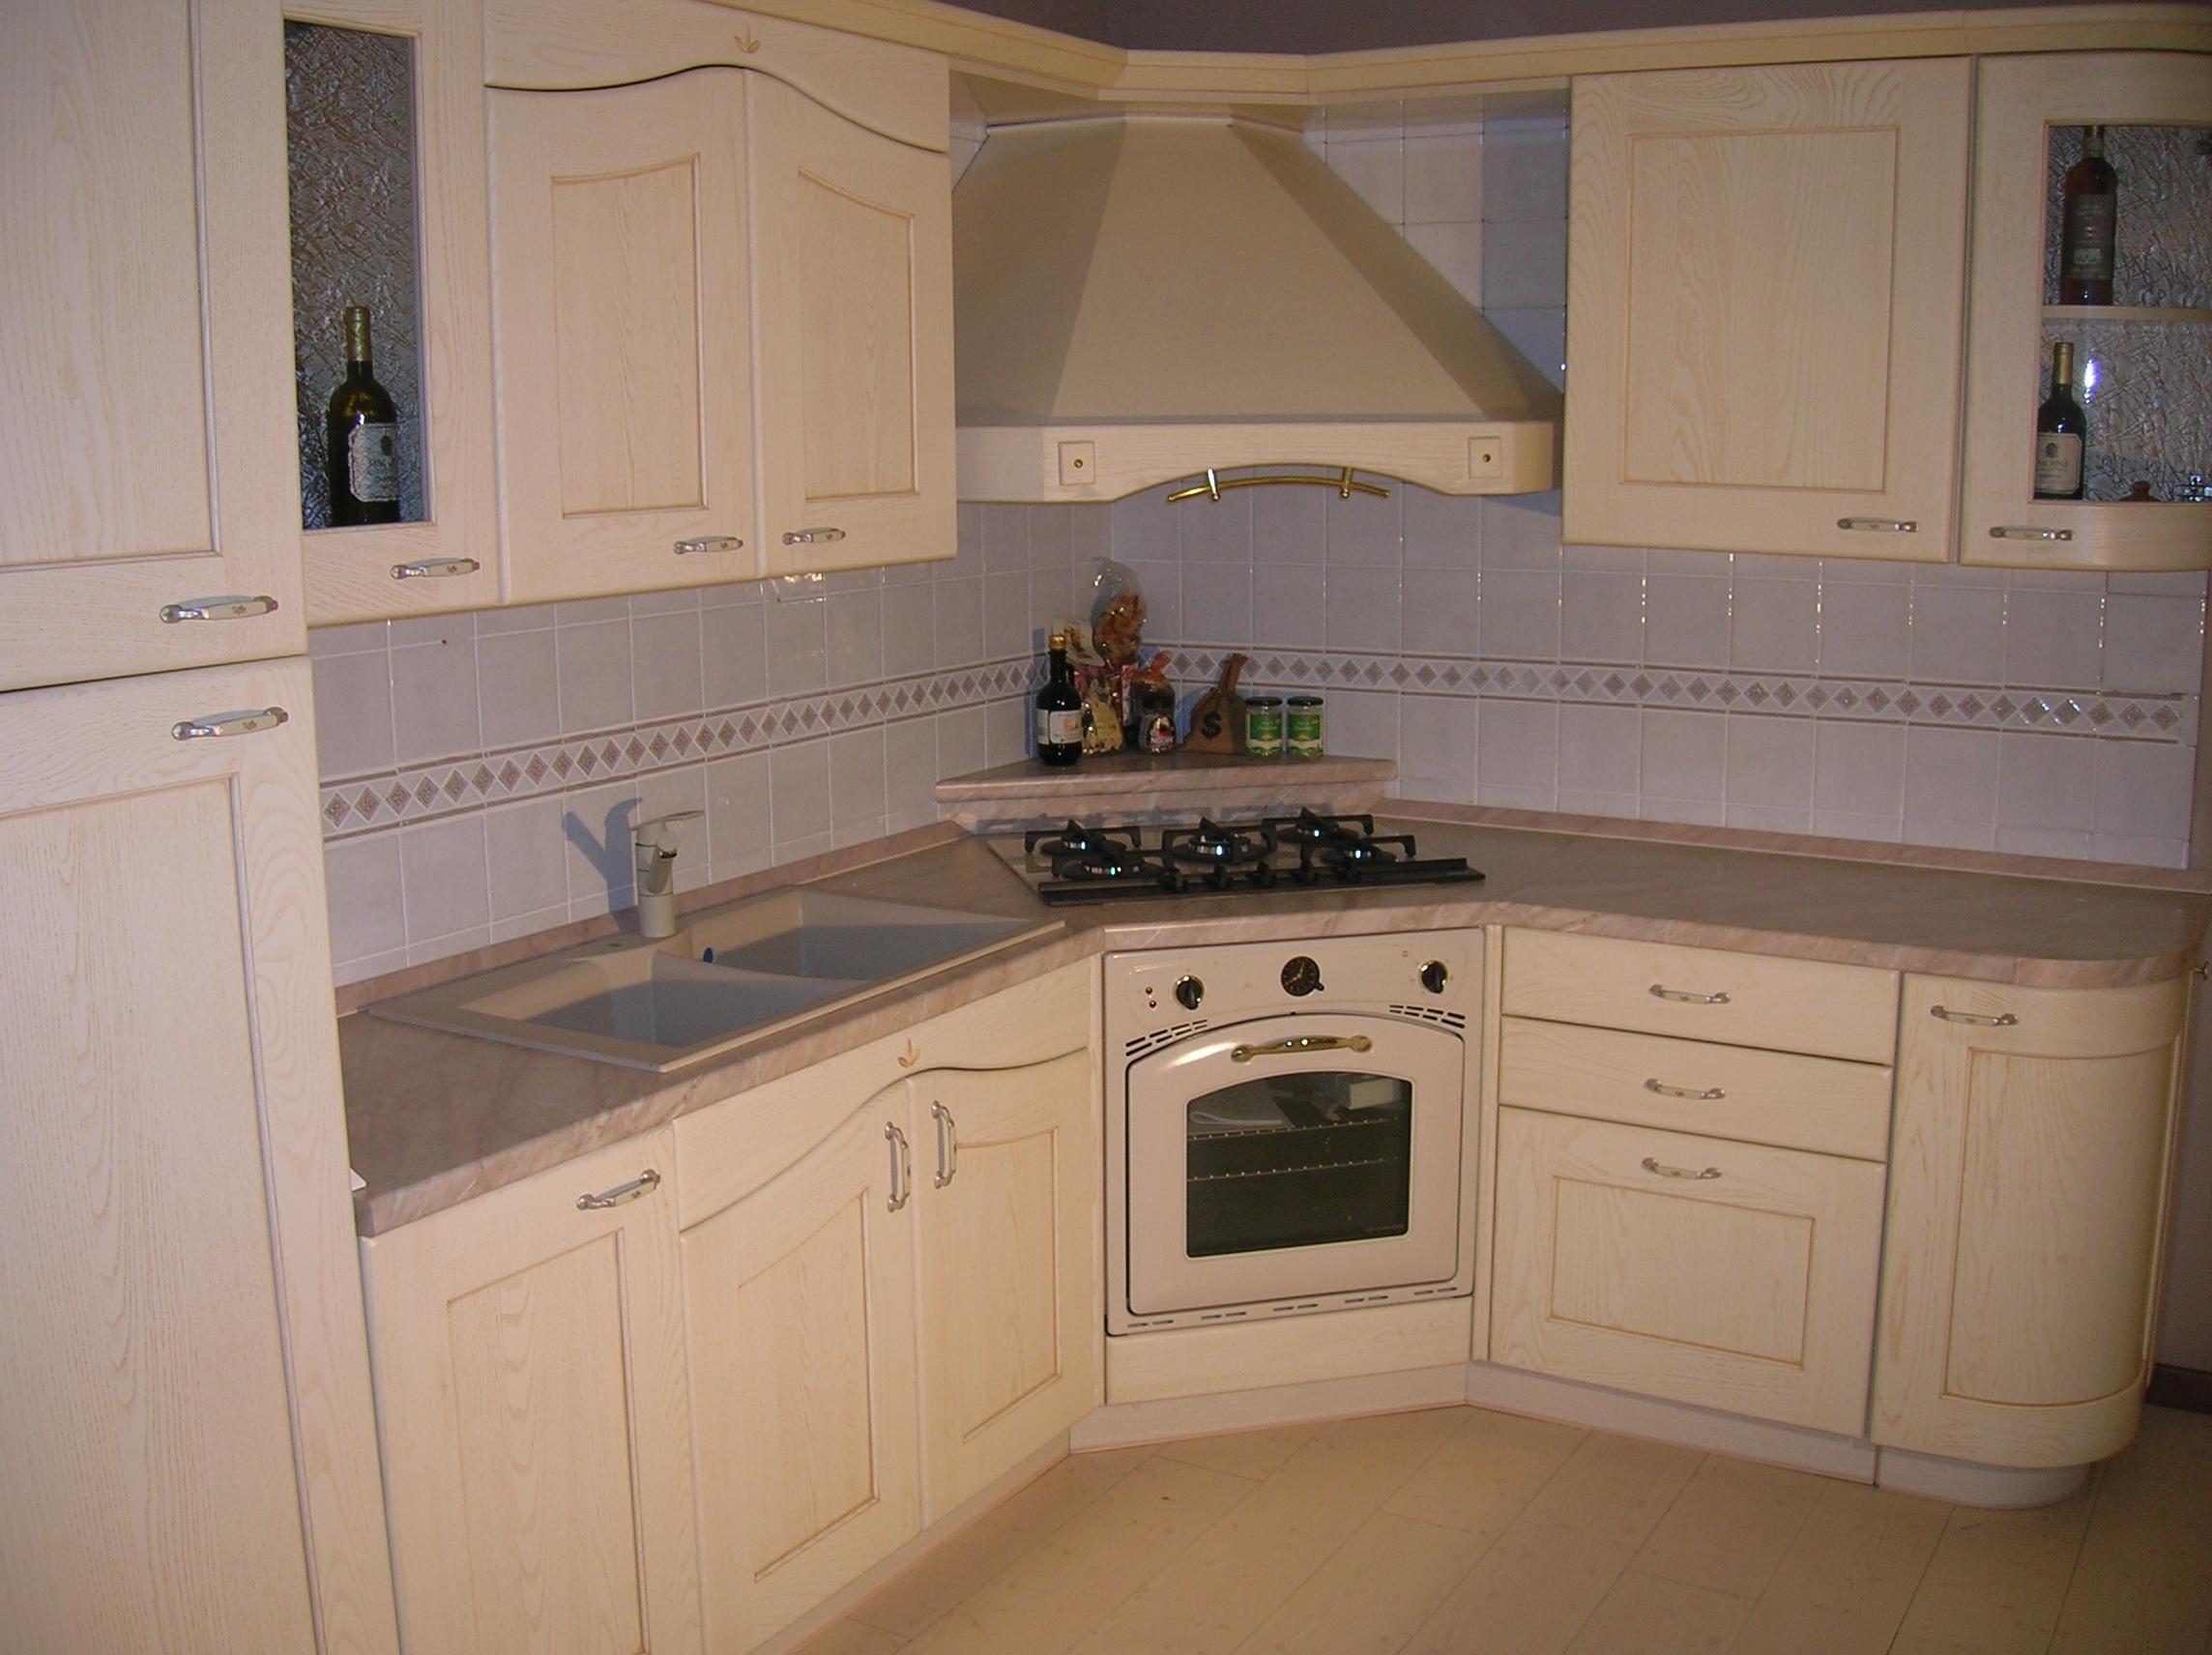 Costi Ristrutturazione Cucina #2085 | msyte.com Idee e foto di ...